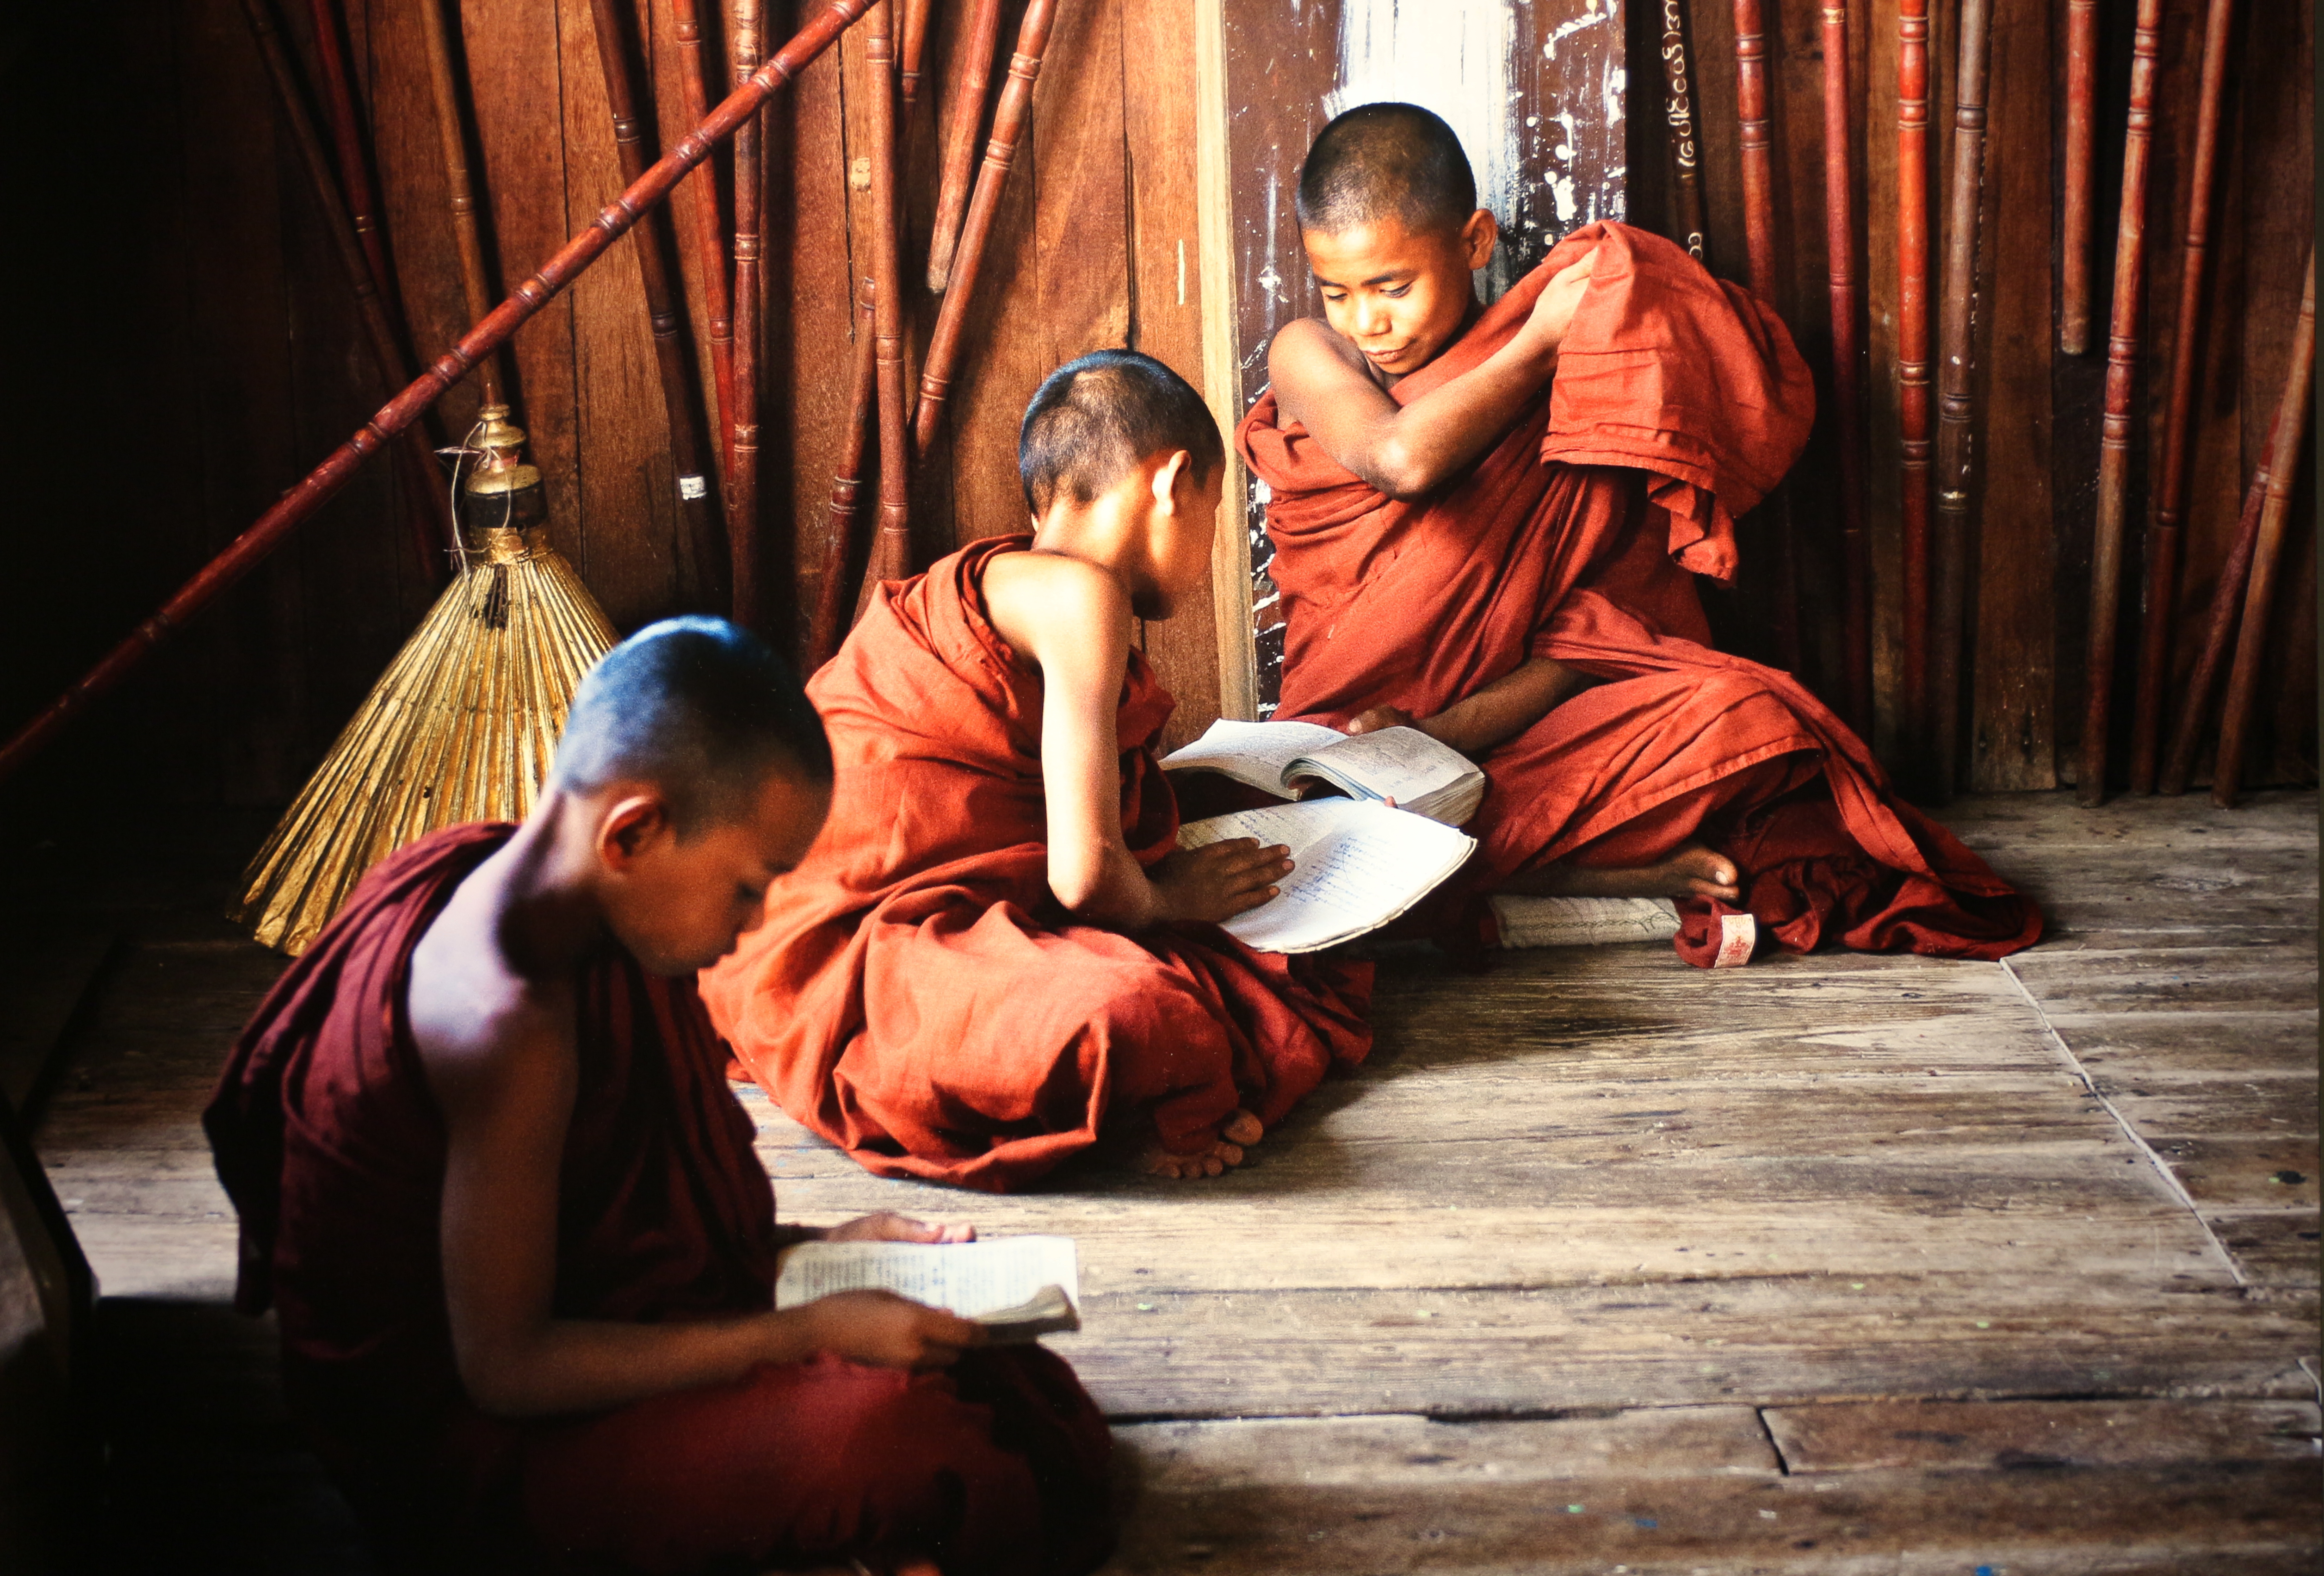 S. McCurry, Birmania, 2010